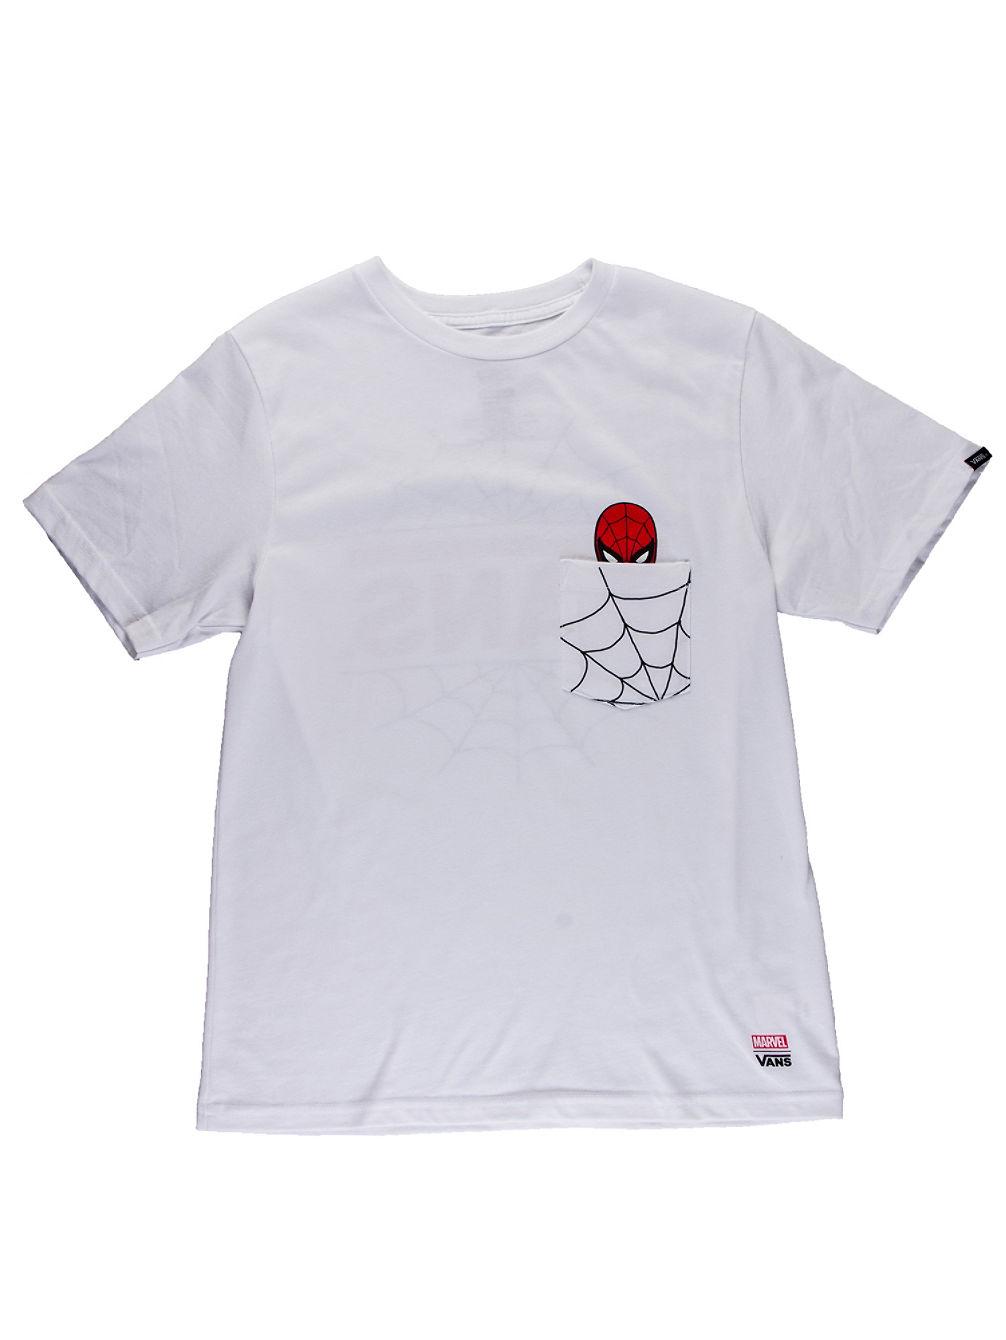 d64cd2f0fa4b1f Buy Vans Marvel Spiderman Pocket T-Shirt online at Blue Tomato